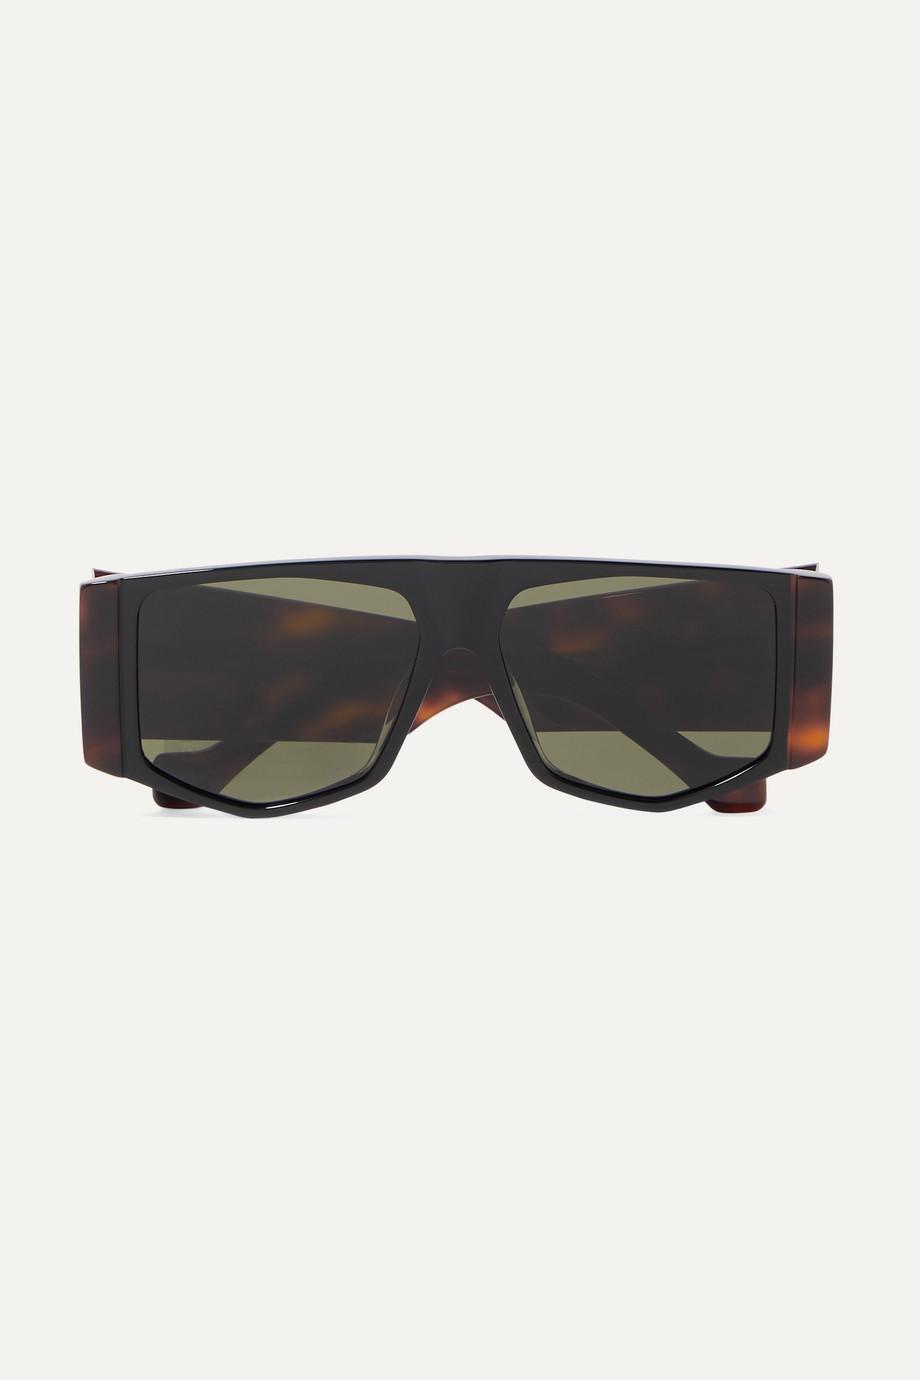 Loewe Oversized-Sonnenbrille mit sechseckigem Rahmen aus Azetat in Hornoptik